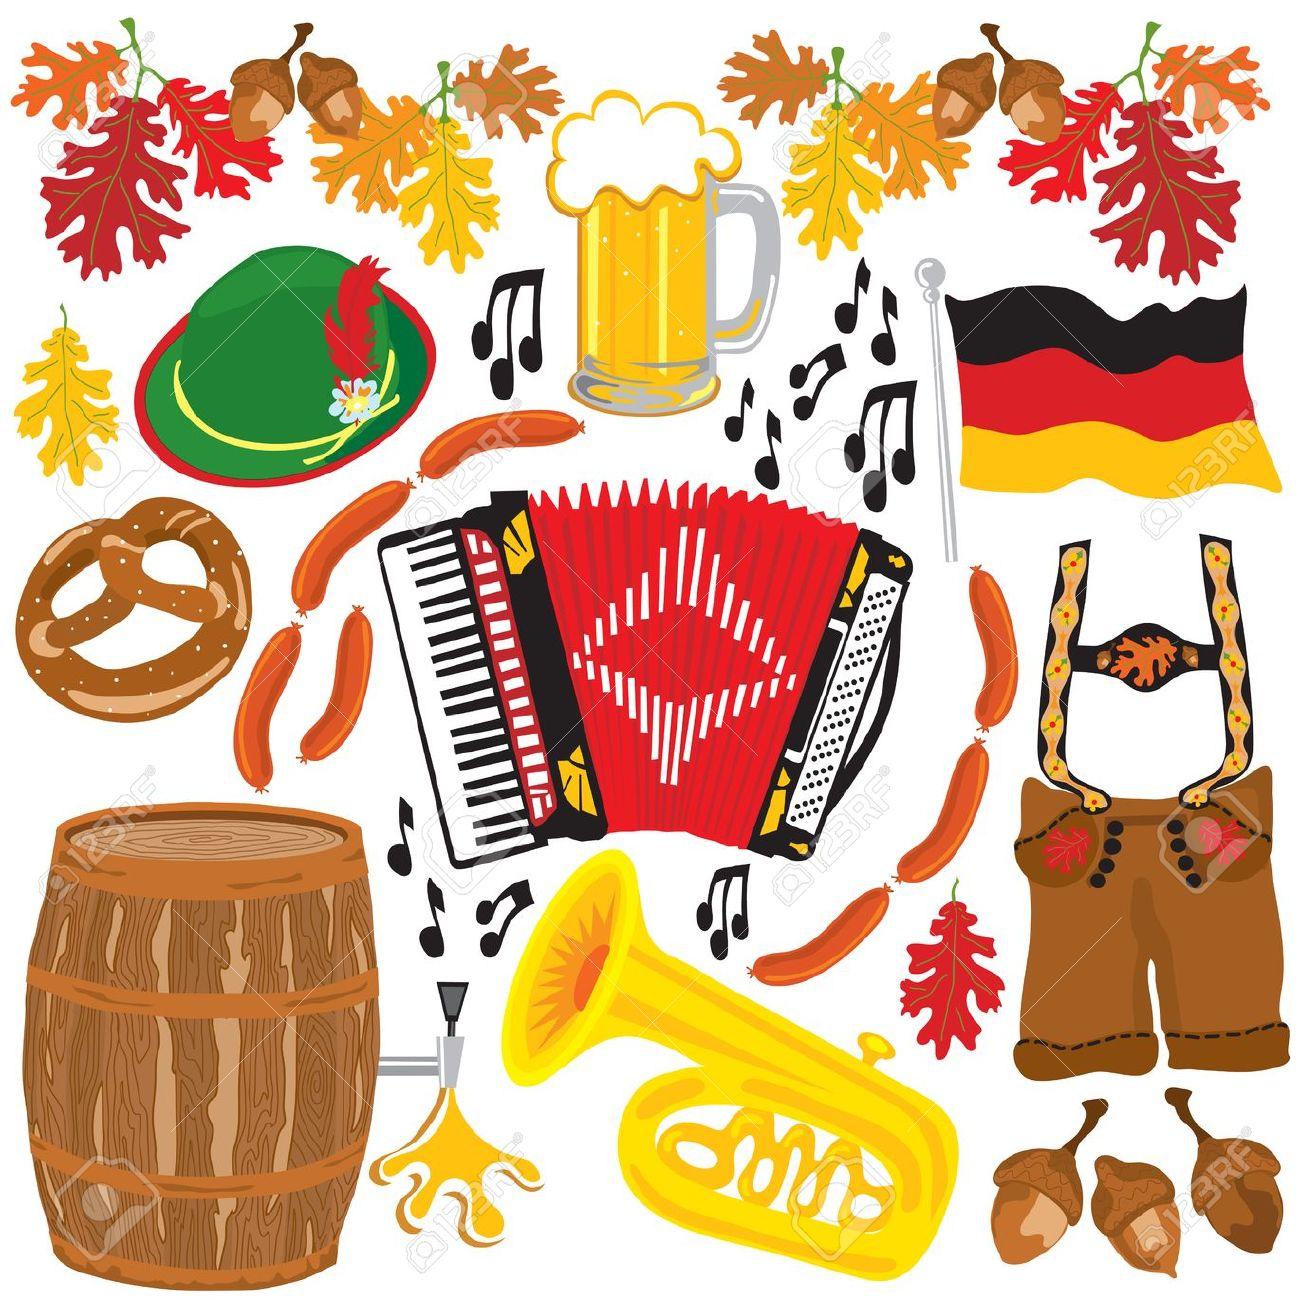 German clipart #6, Download drawings